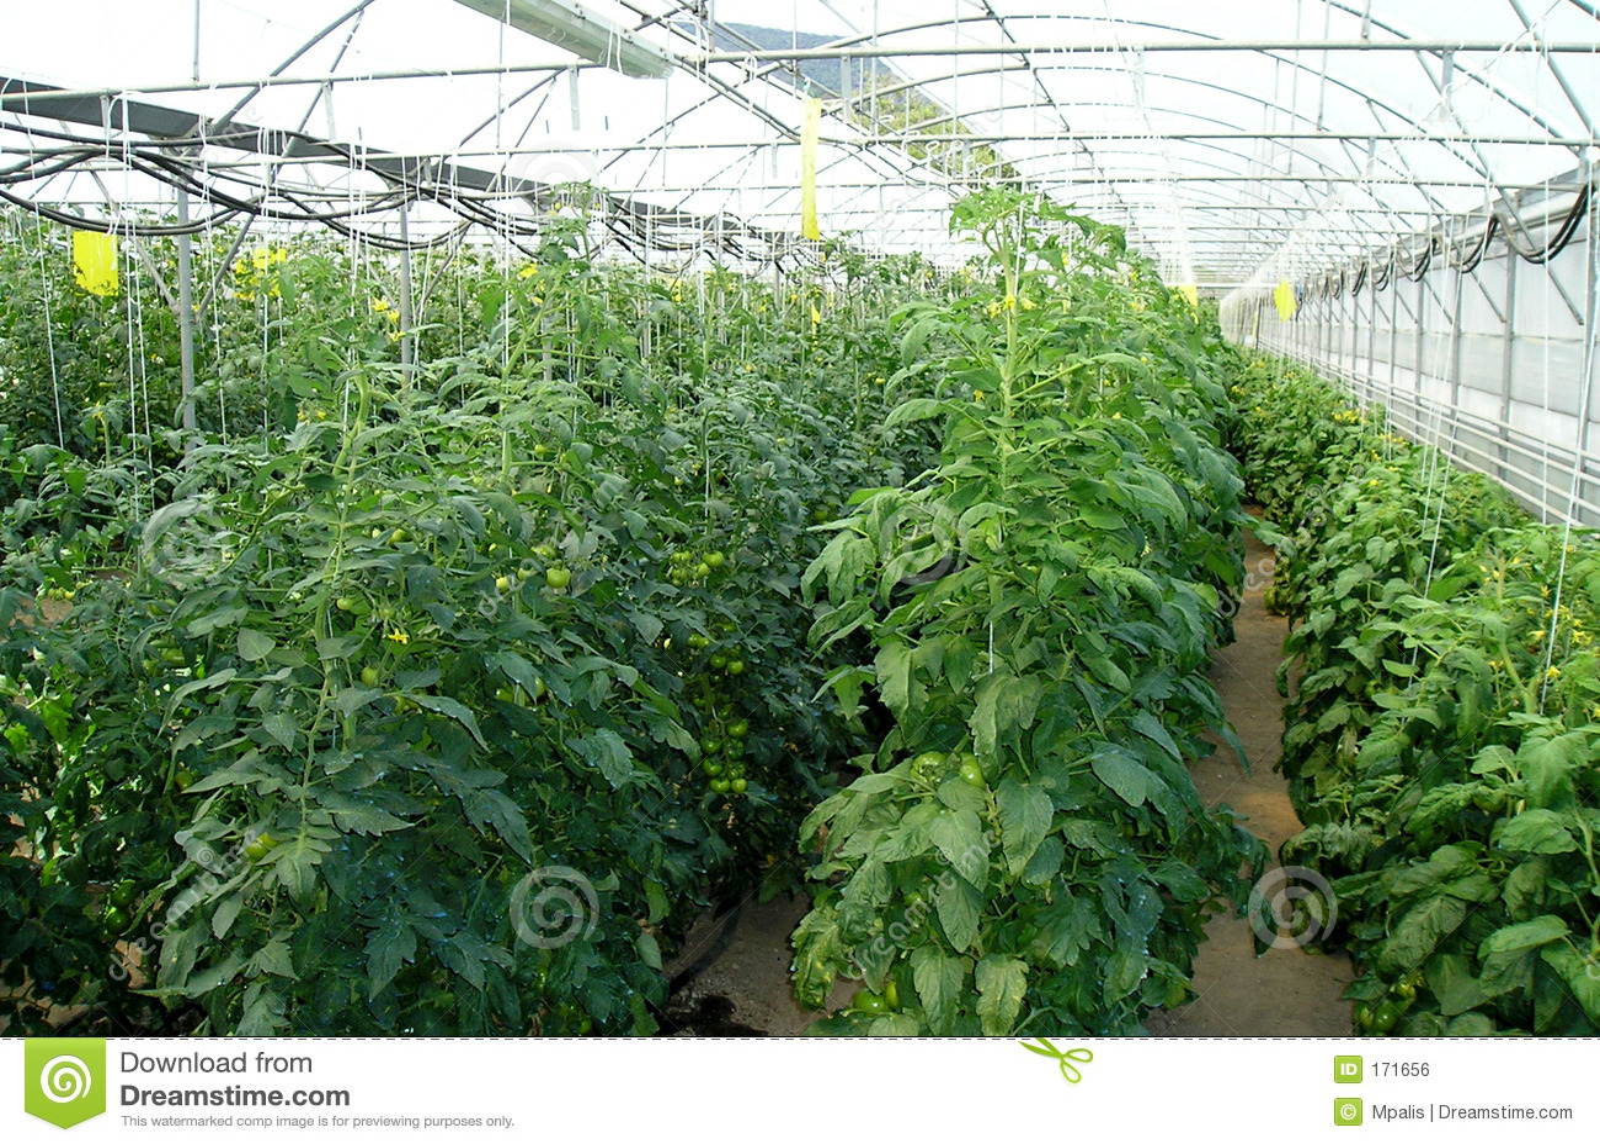 Greenhouse for vegetables